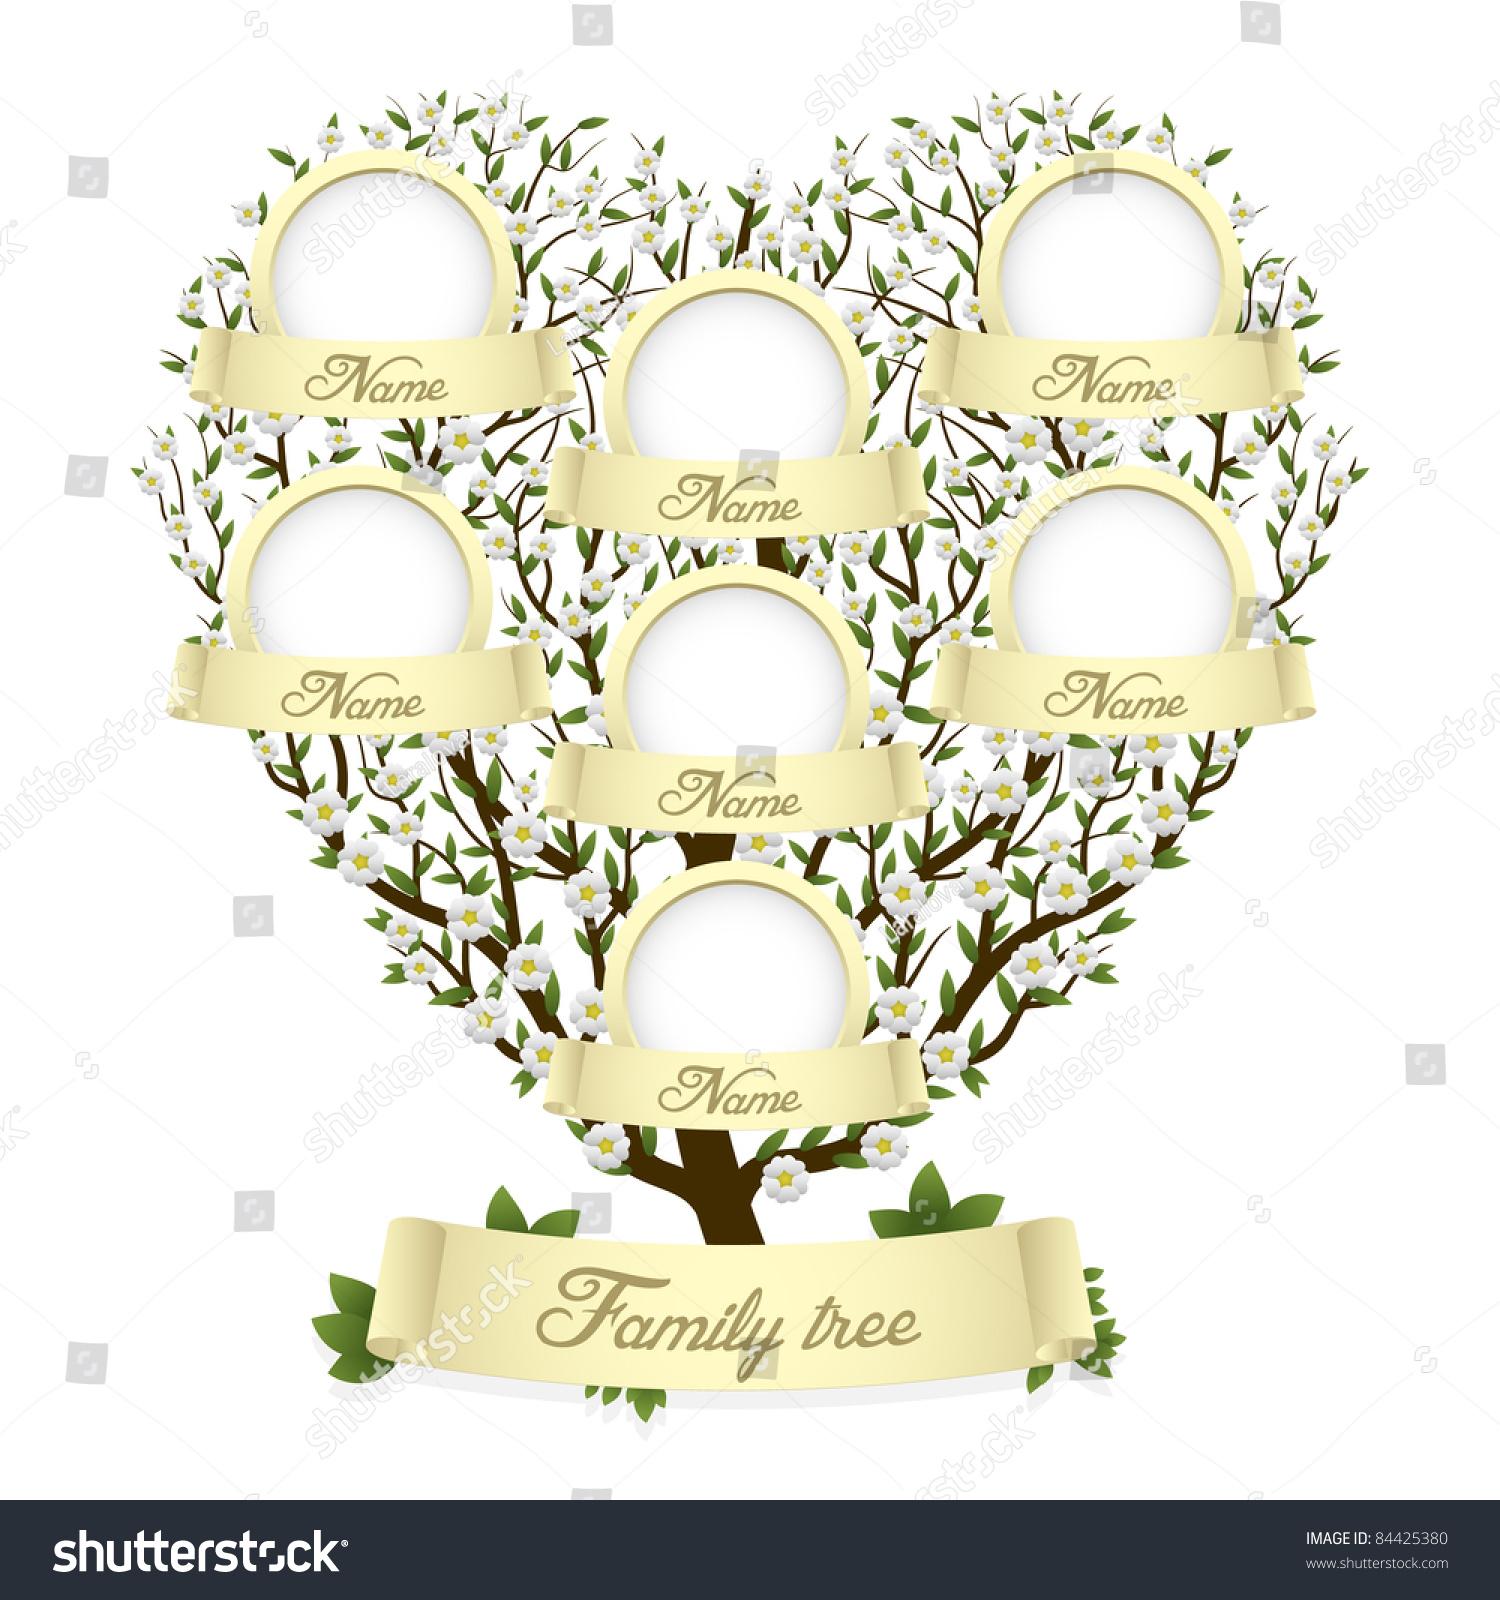 Family Tree Heart Shape Vector Illustration Stock Vector ...